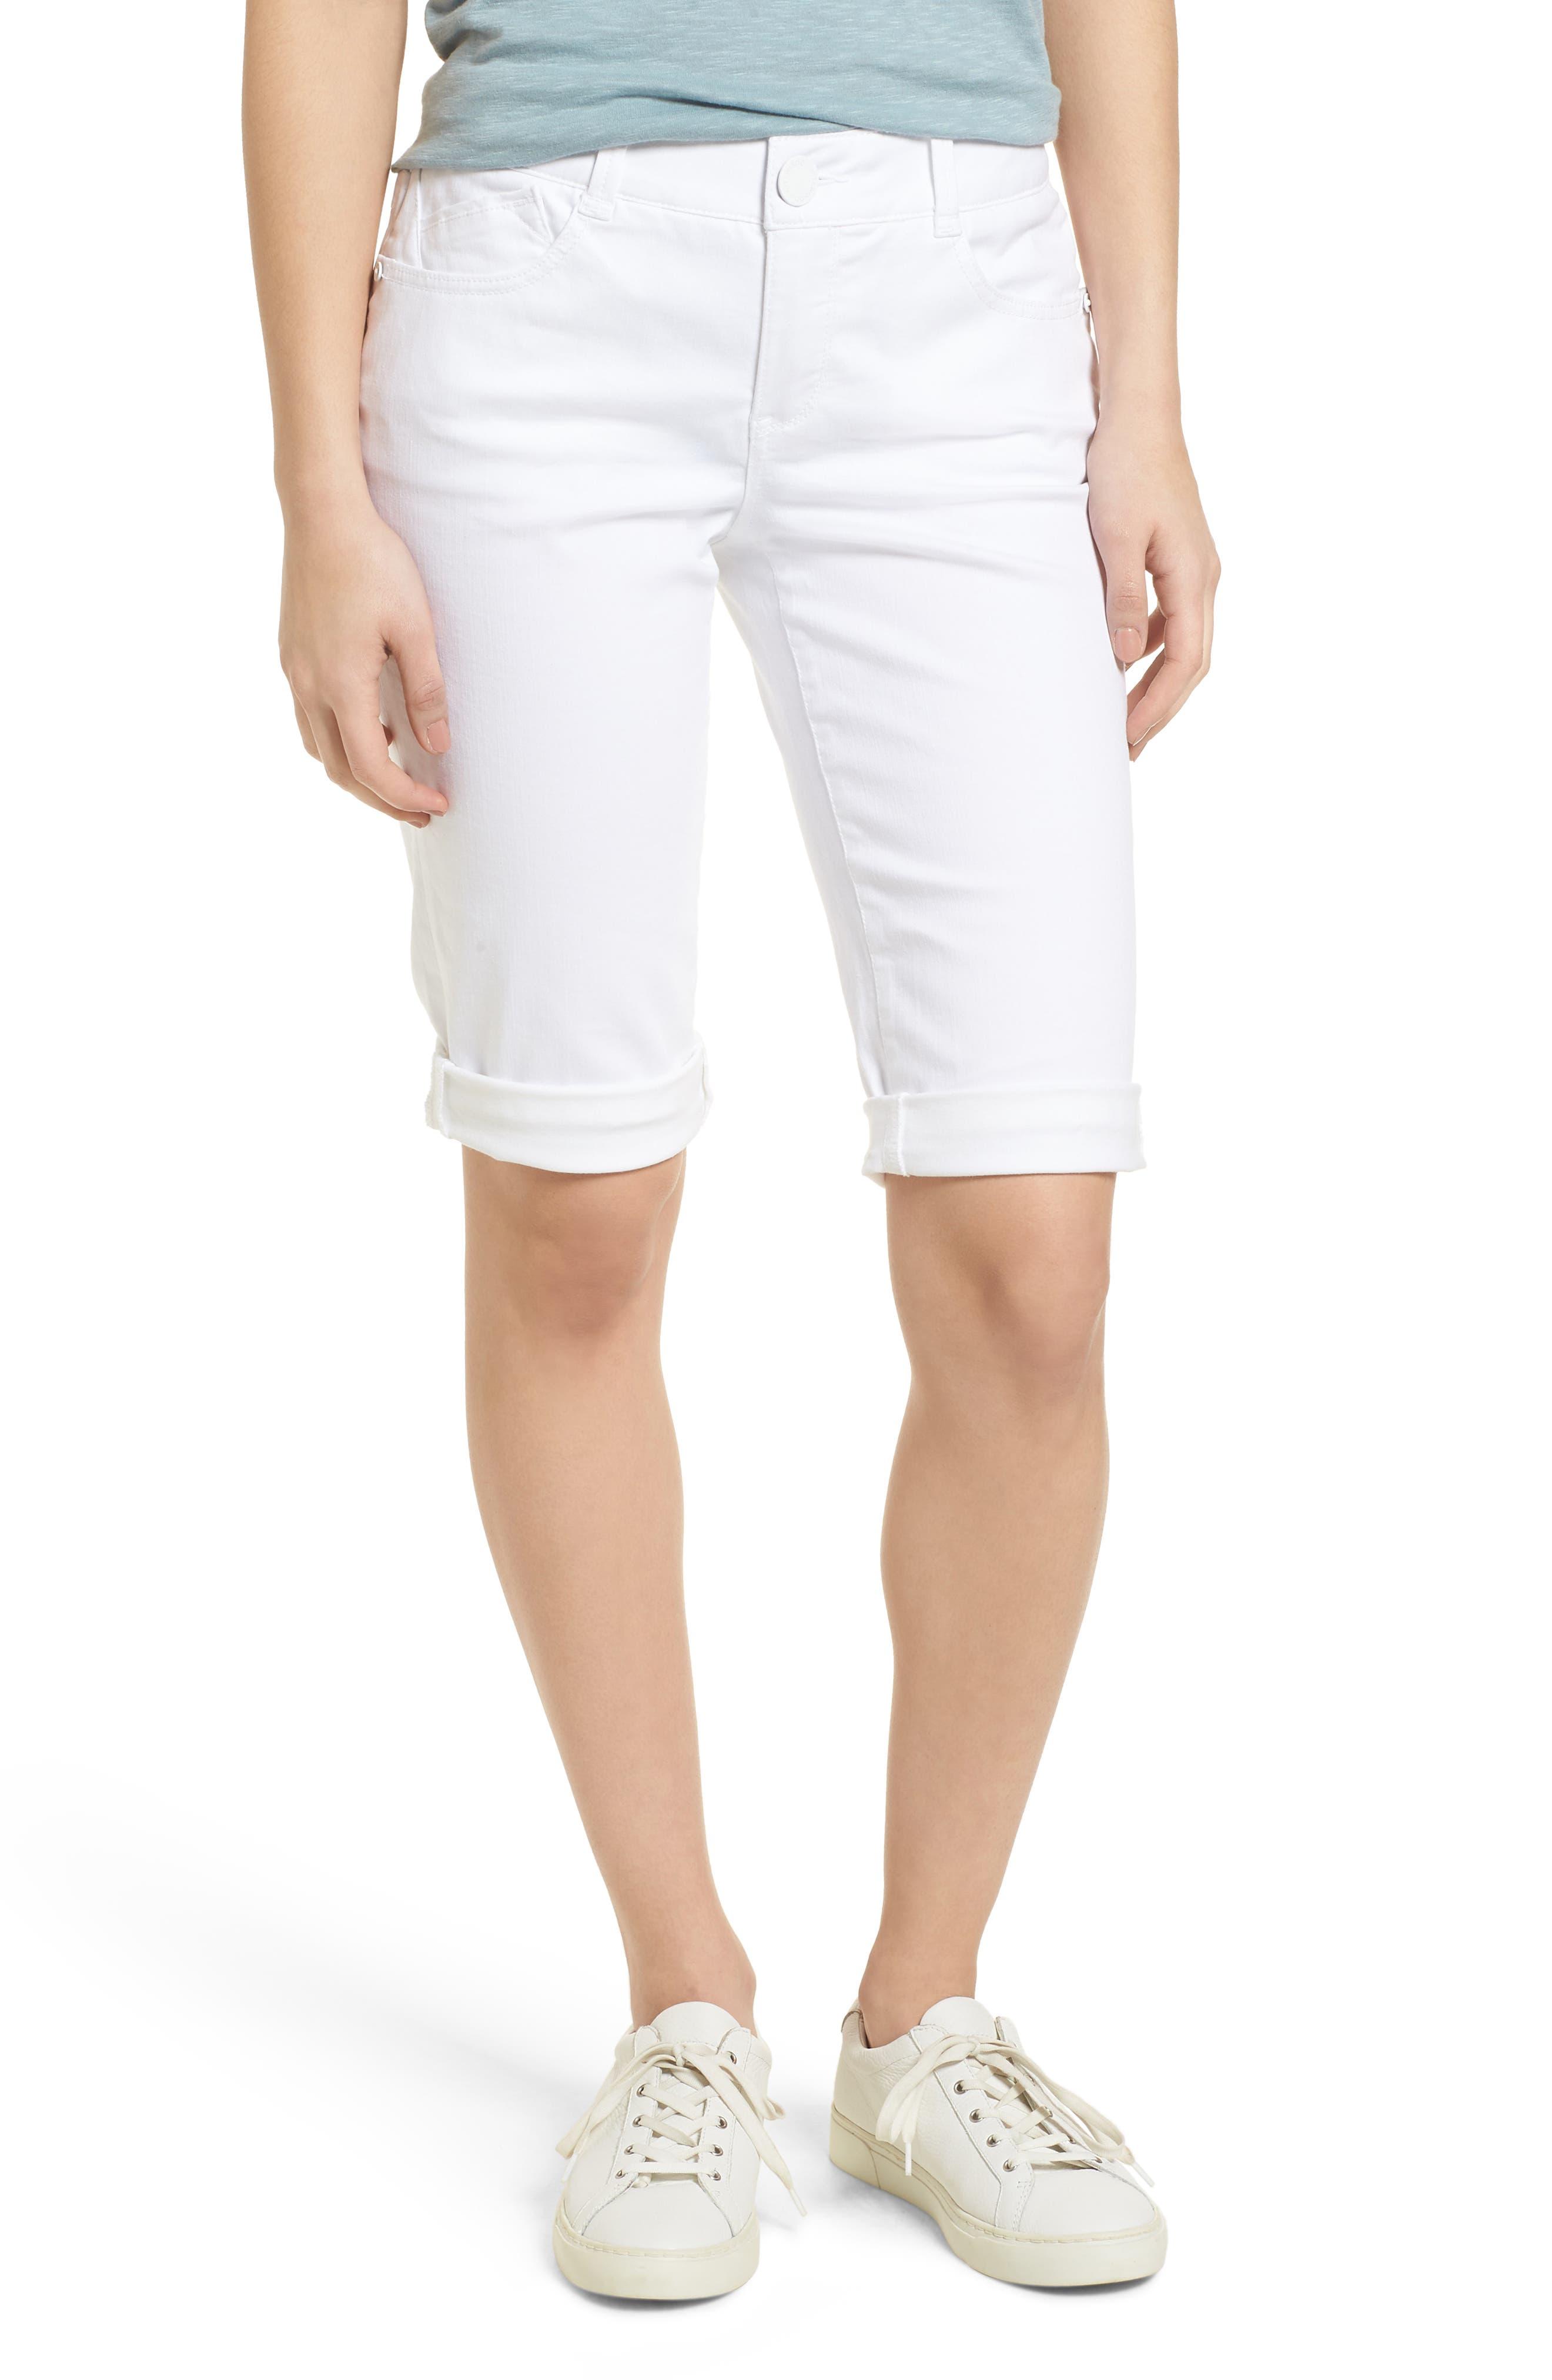 WIT & WISDOM Ab-solution White Bermuda Shorts, Main, color, OPTIC WHITE